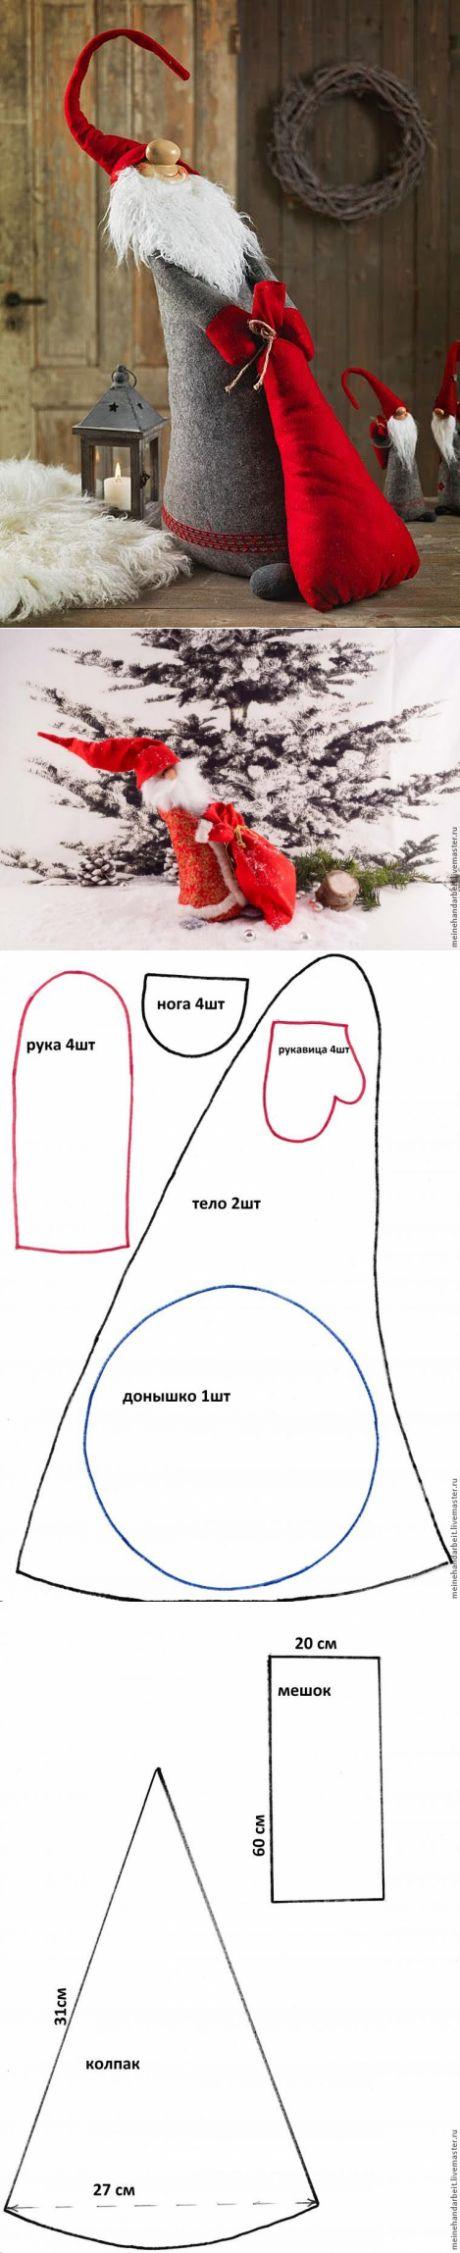 Санта Клаус,Дед Мороз или Гном? Мастер класс.Выкройка